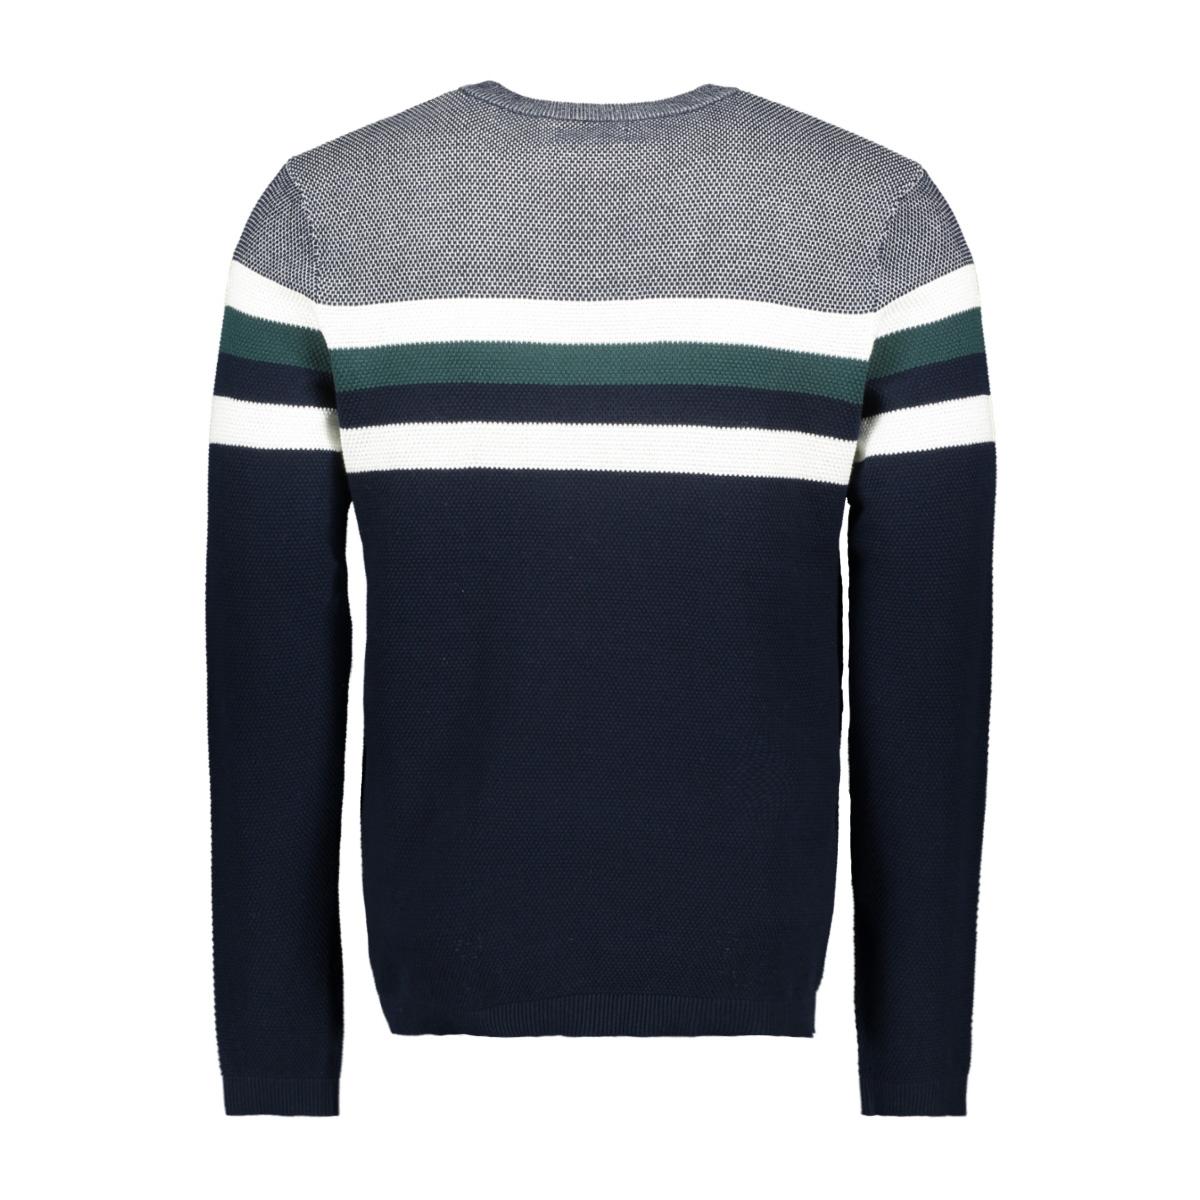 jorlarry knit crew neck 12155586 jack & jones trui sea moss/knit fit